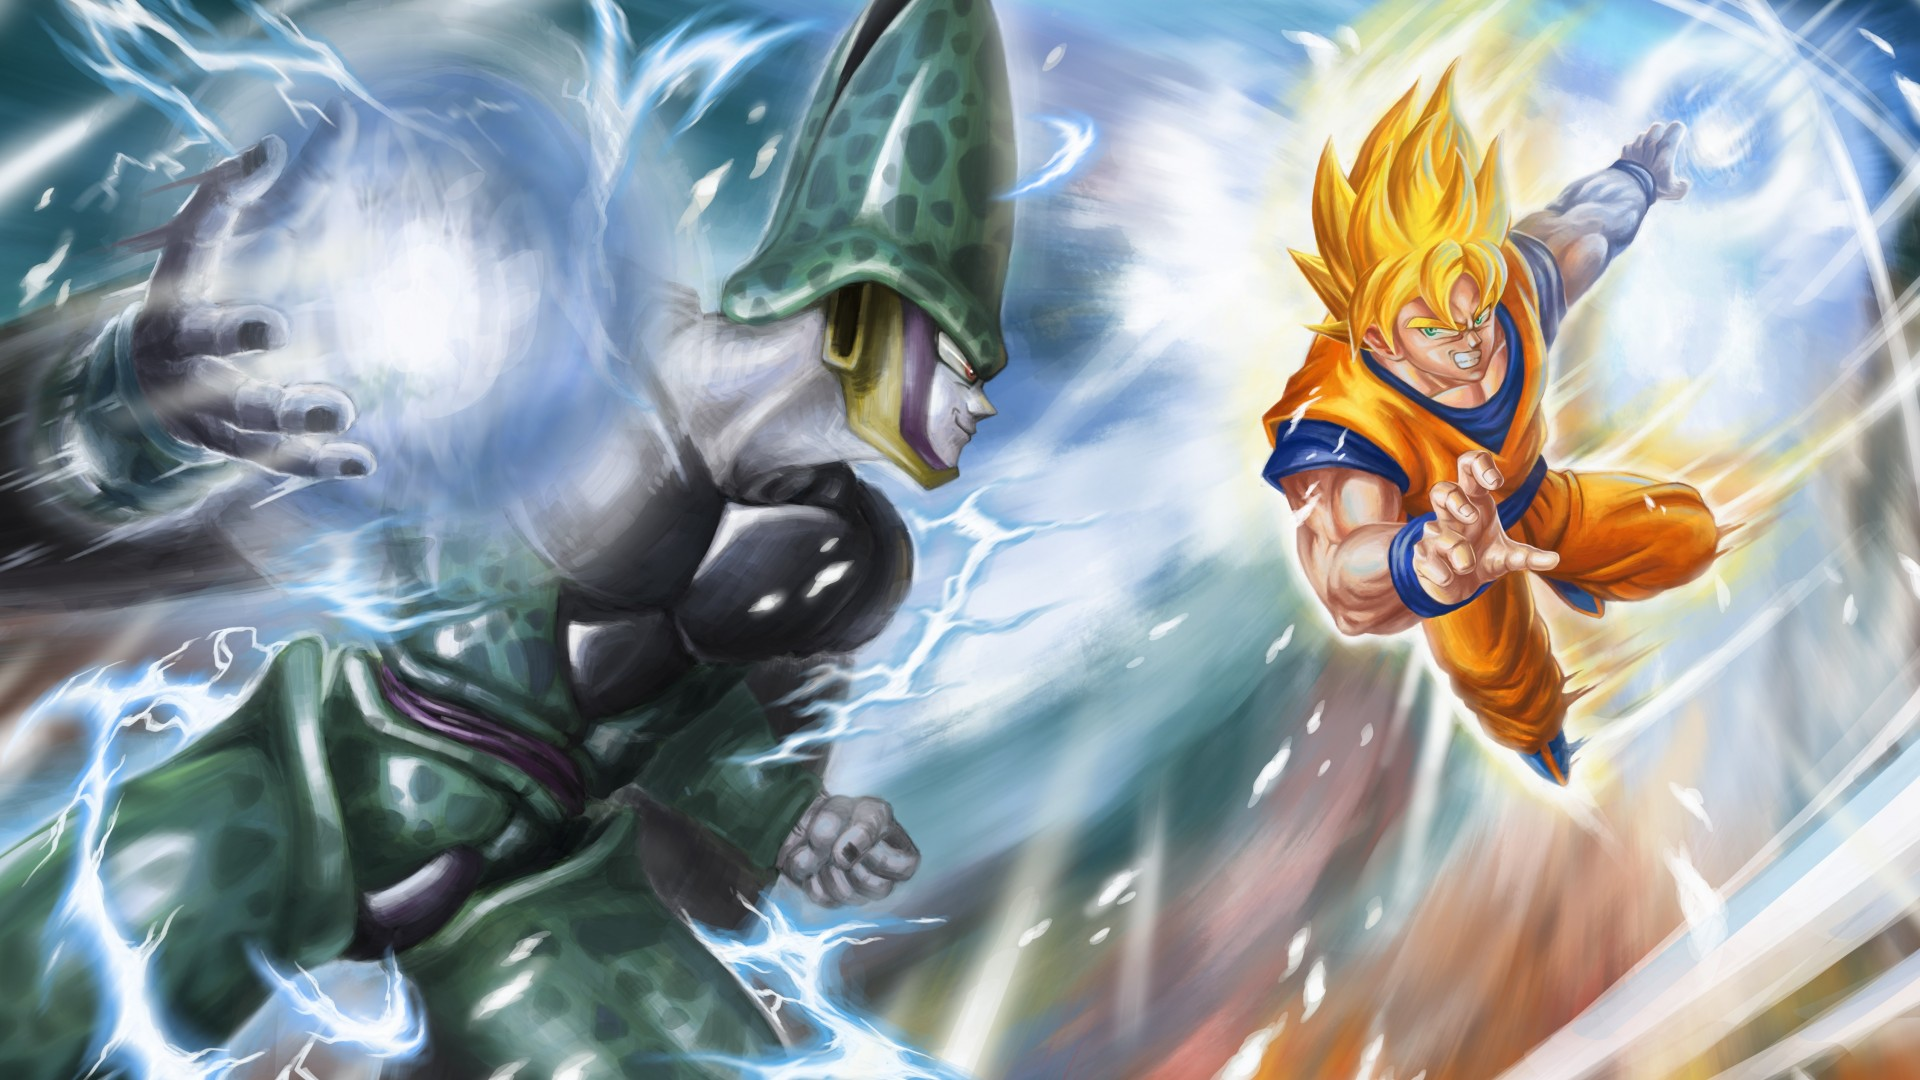 HD Dragon Ball Z Wallpapers Download   791185 1920x1080